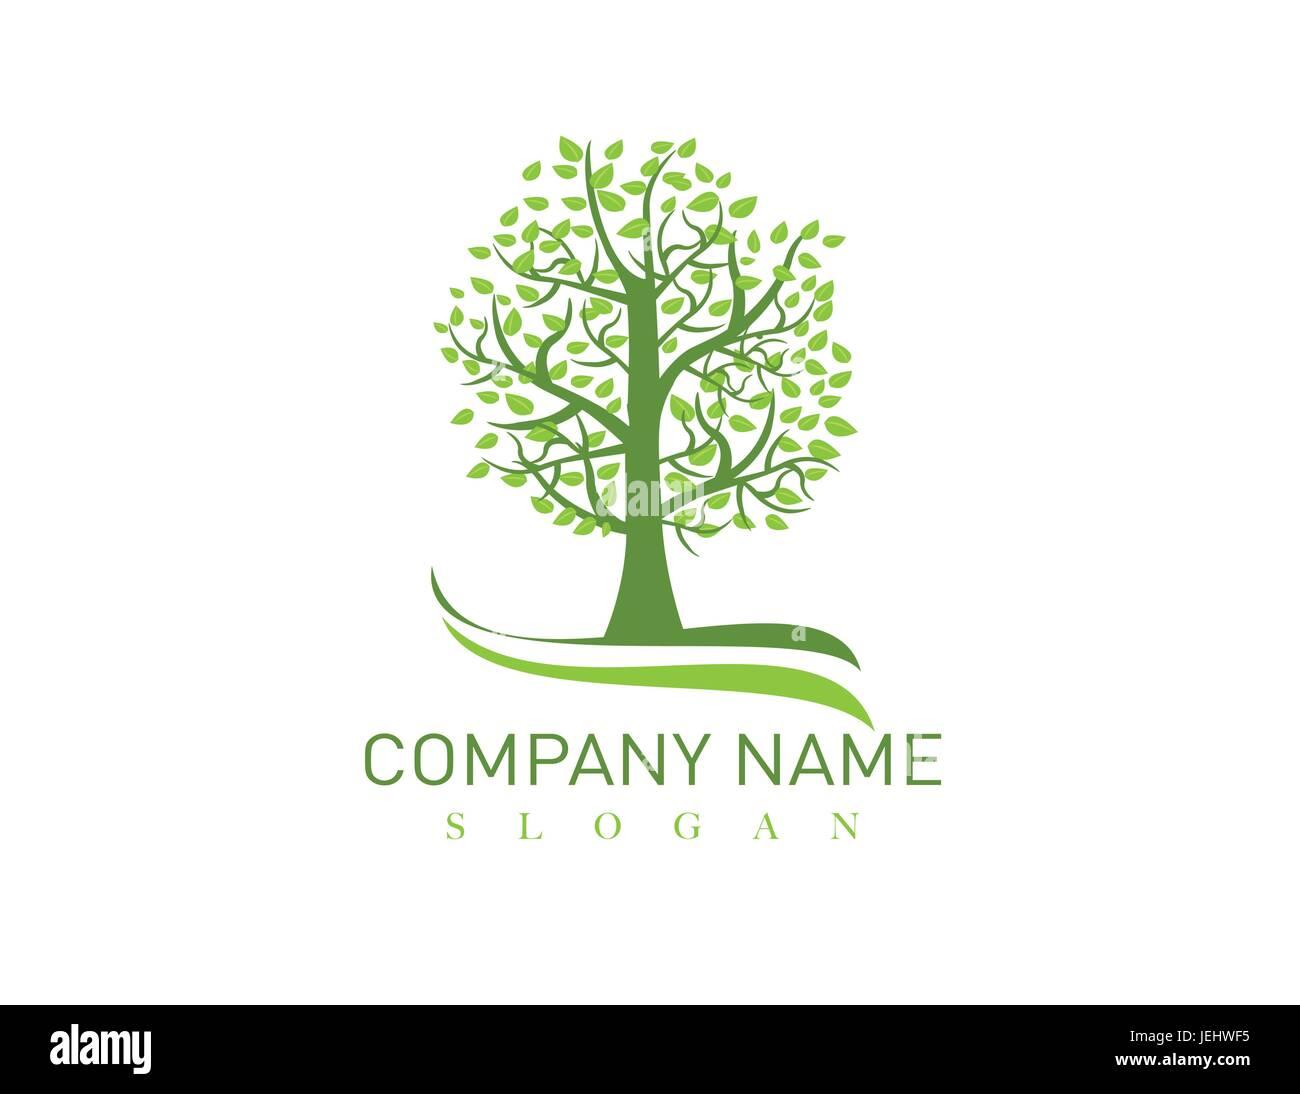 Oak tree logo - Stock Image